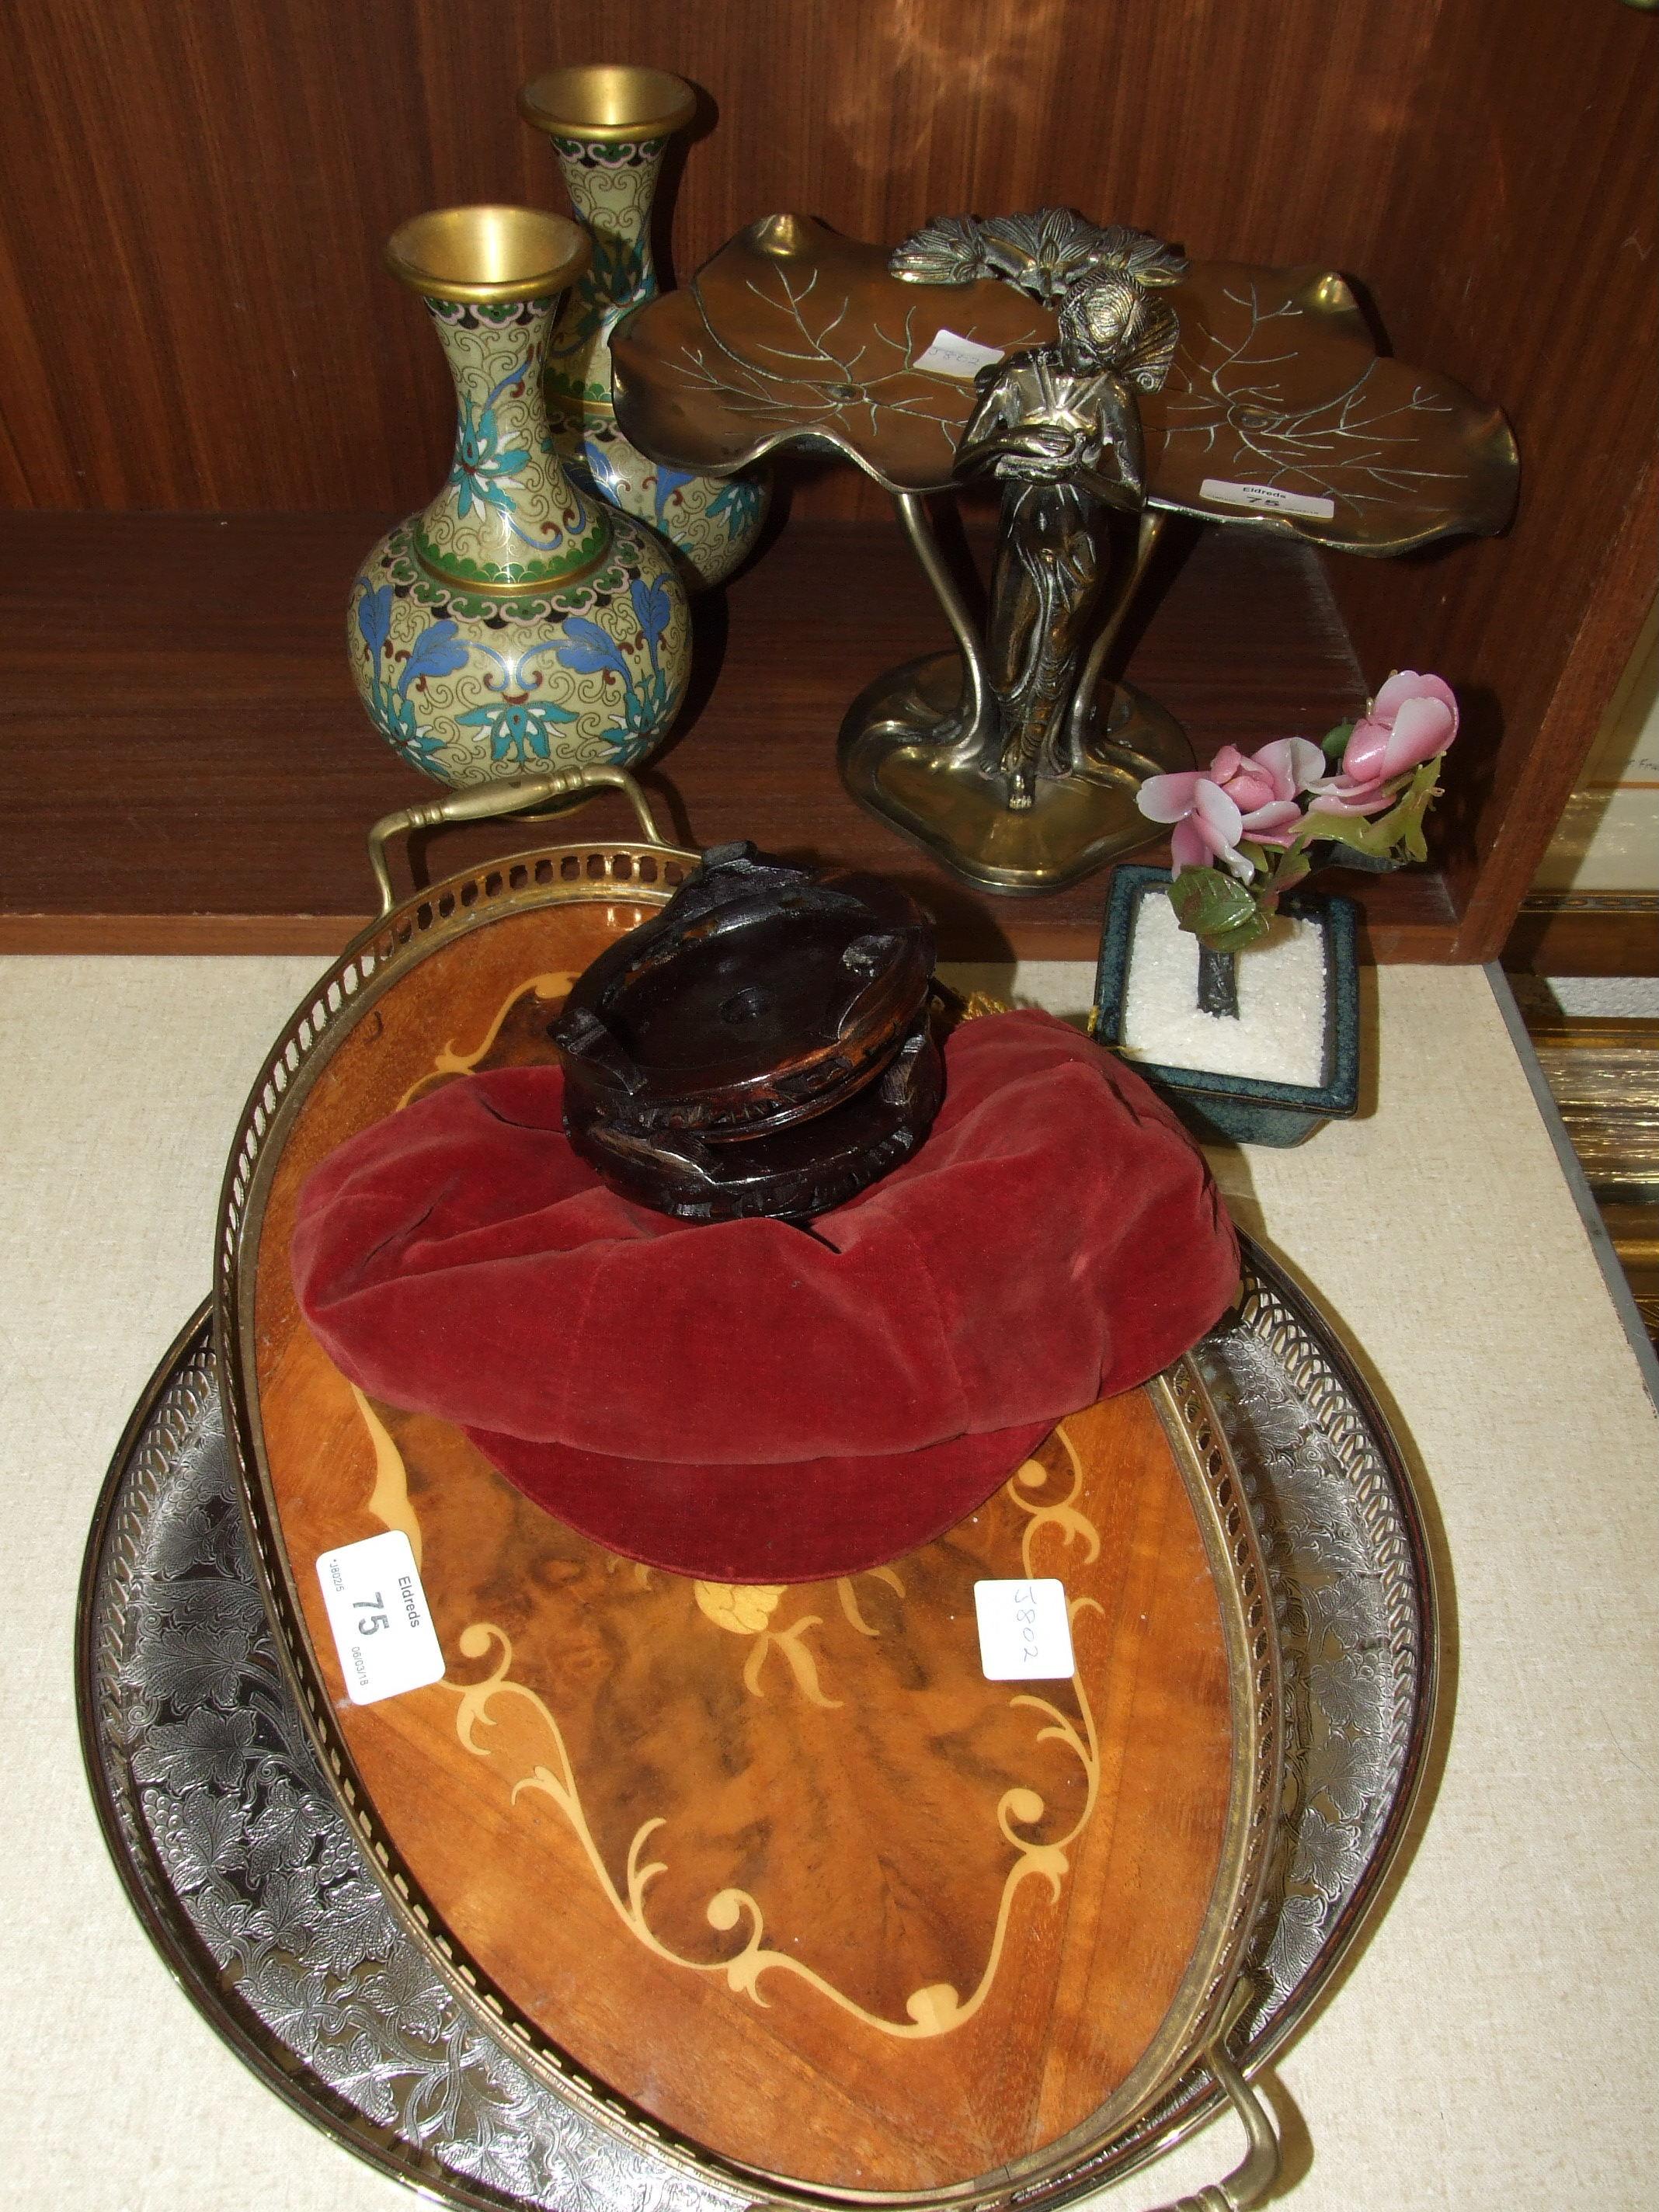 Lot 75 - An Art Nouveau style brass tazza, 20cm high, a pair of modern cloisonné vases, a brass table lamp